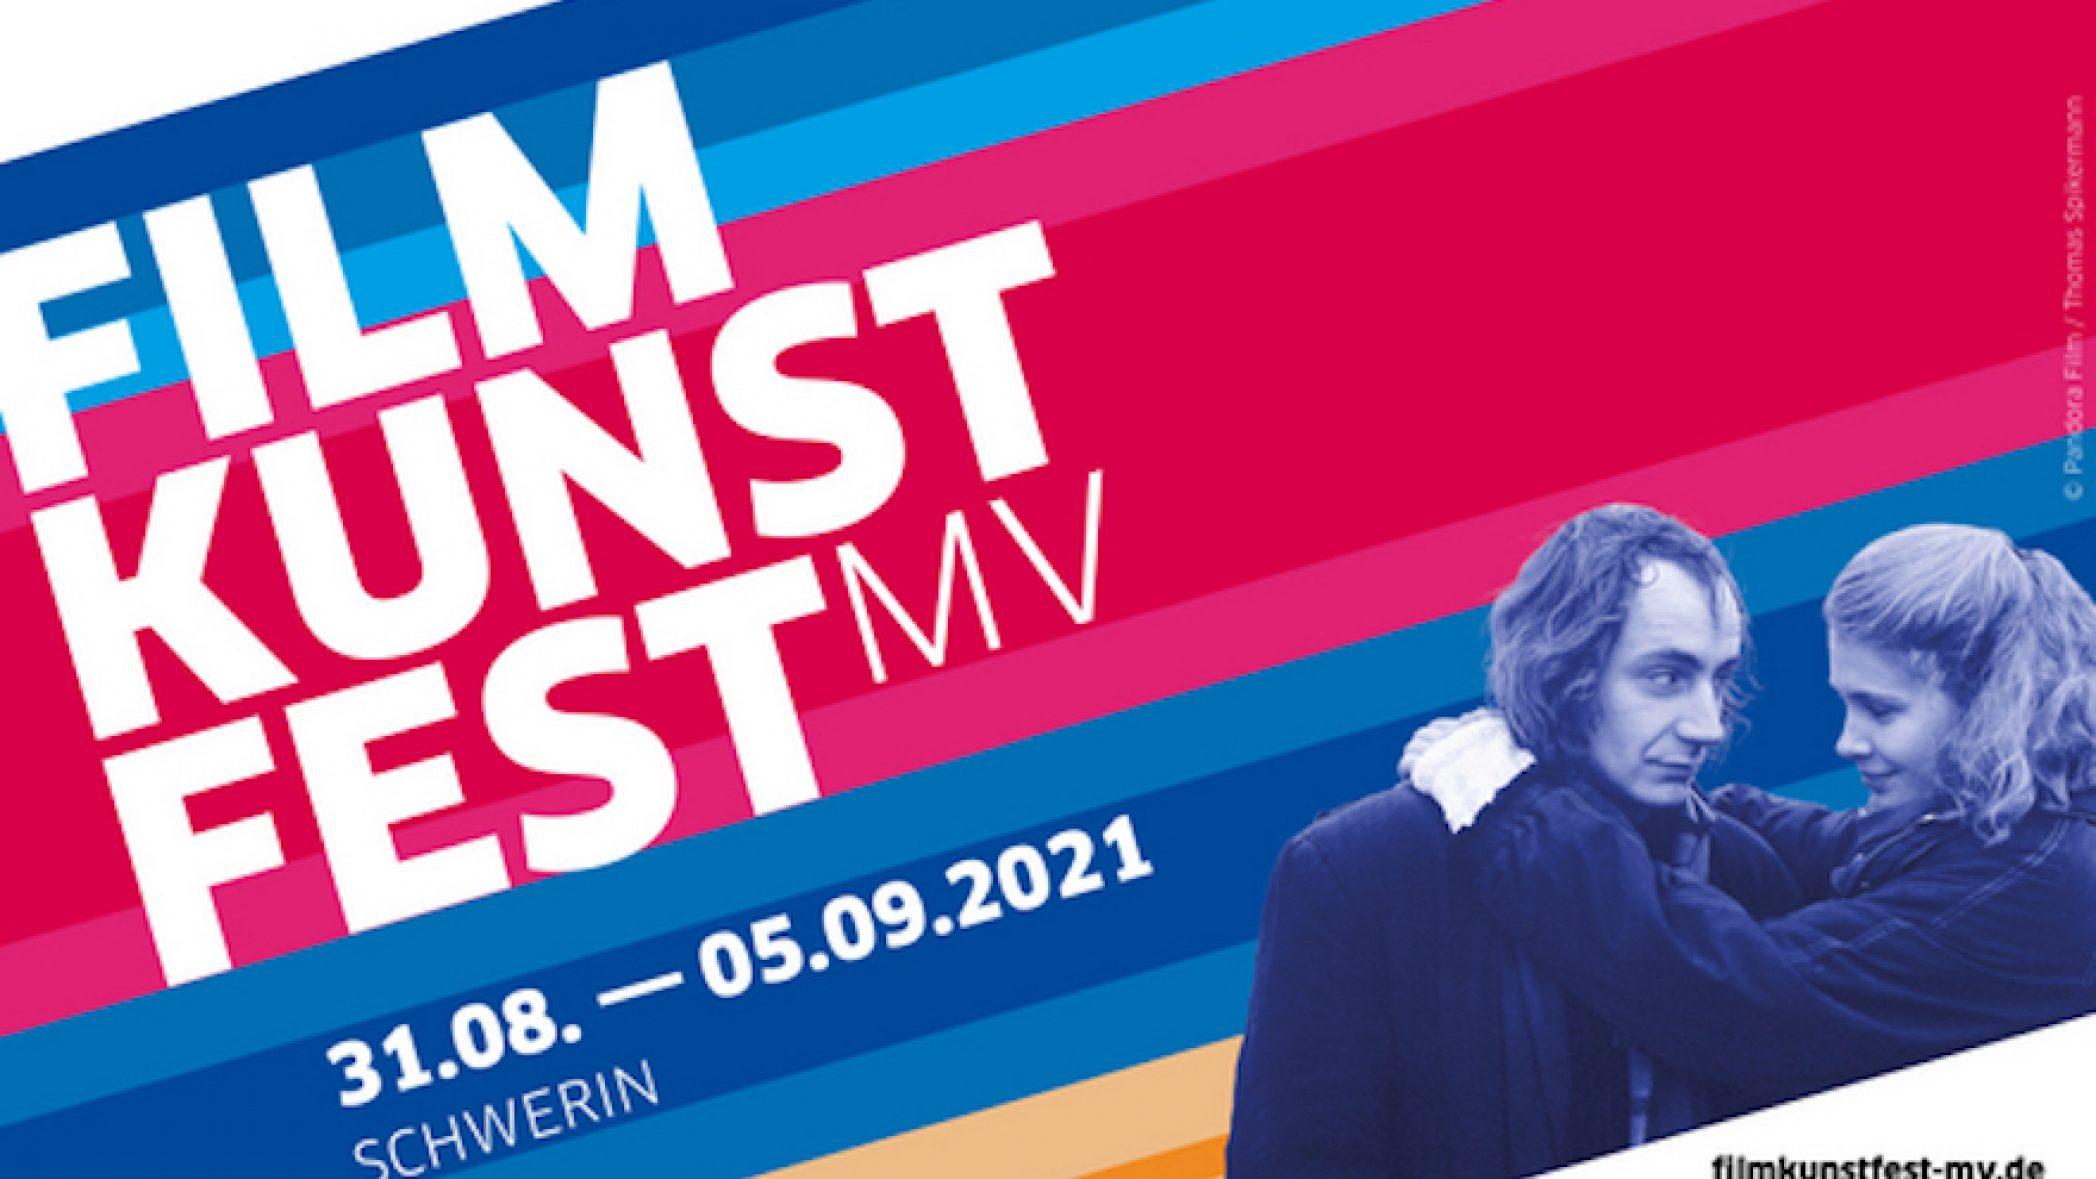 Filmkunstfest Mecklenburg-Vorpommern